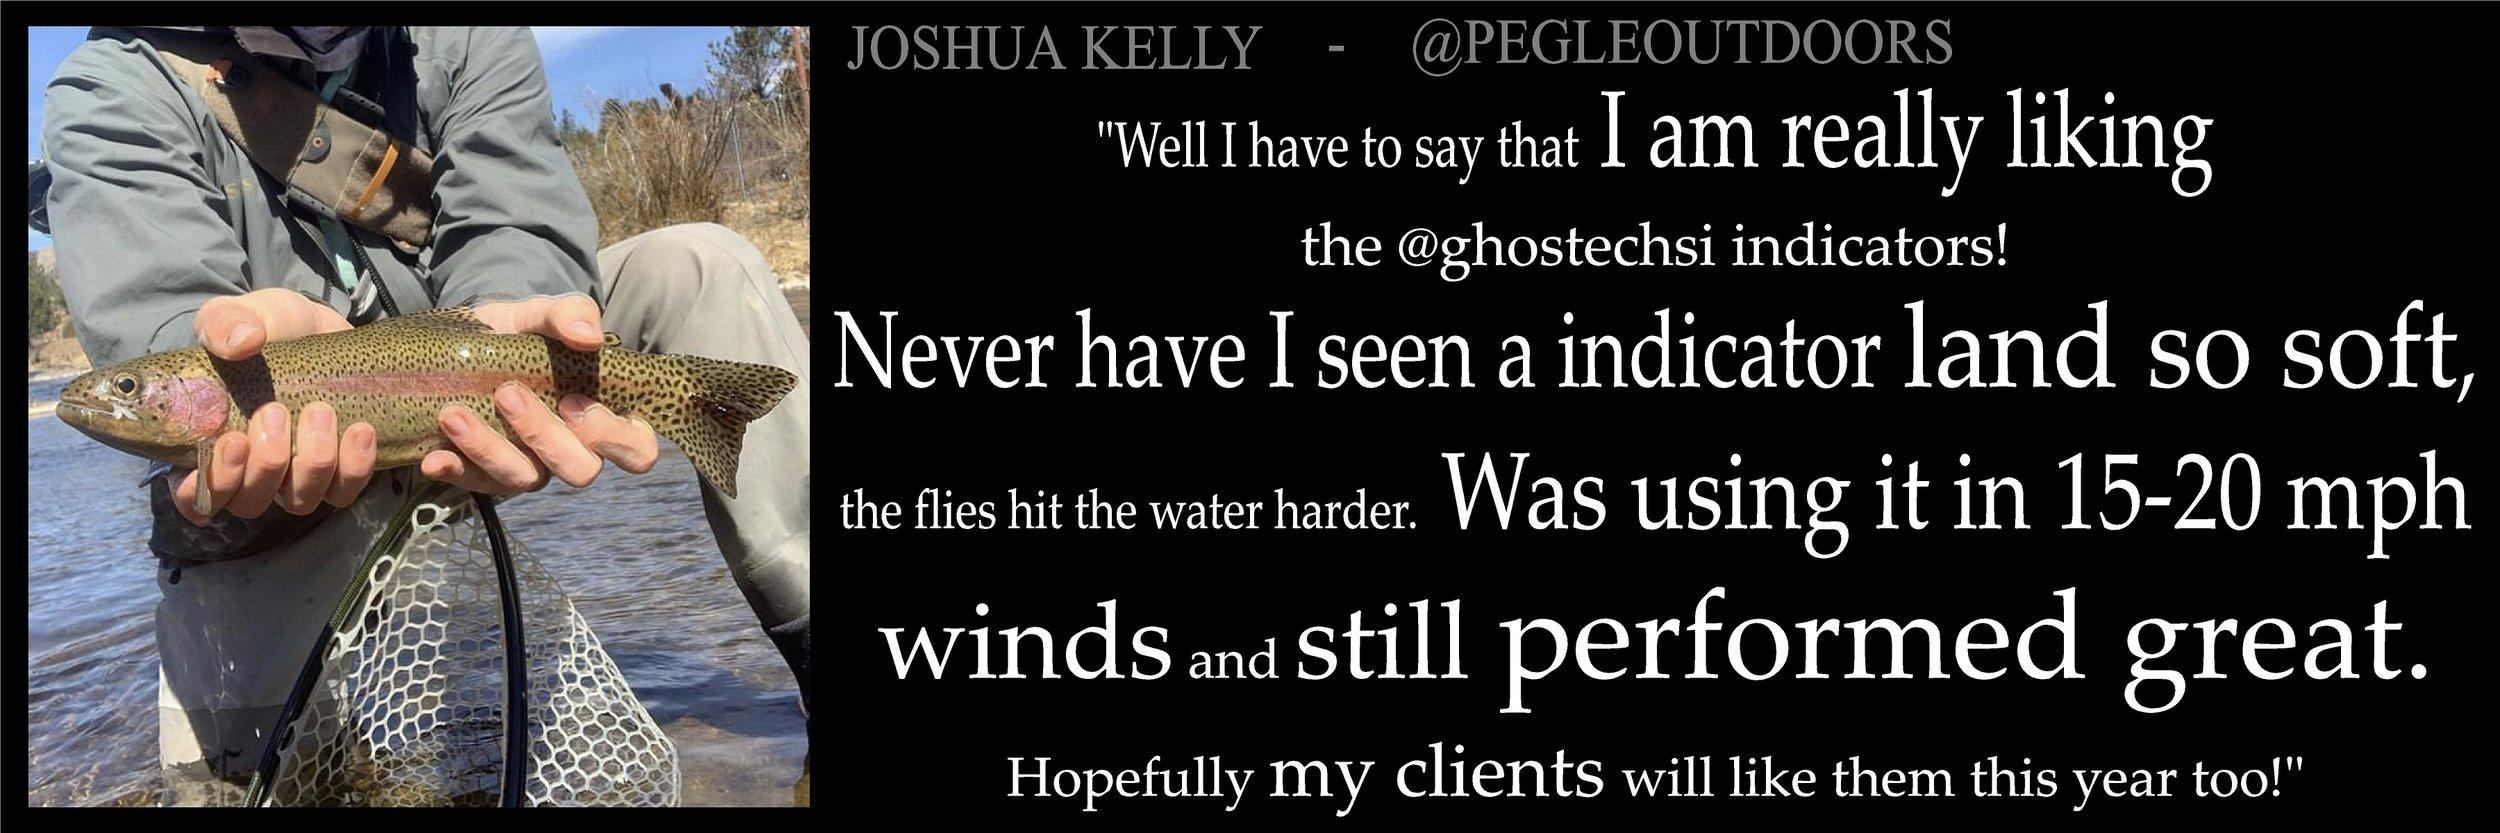 Ghostech testimonial rotator_06242019_Joshua Kelly.jpg